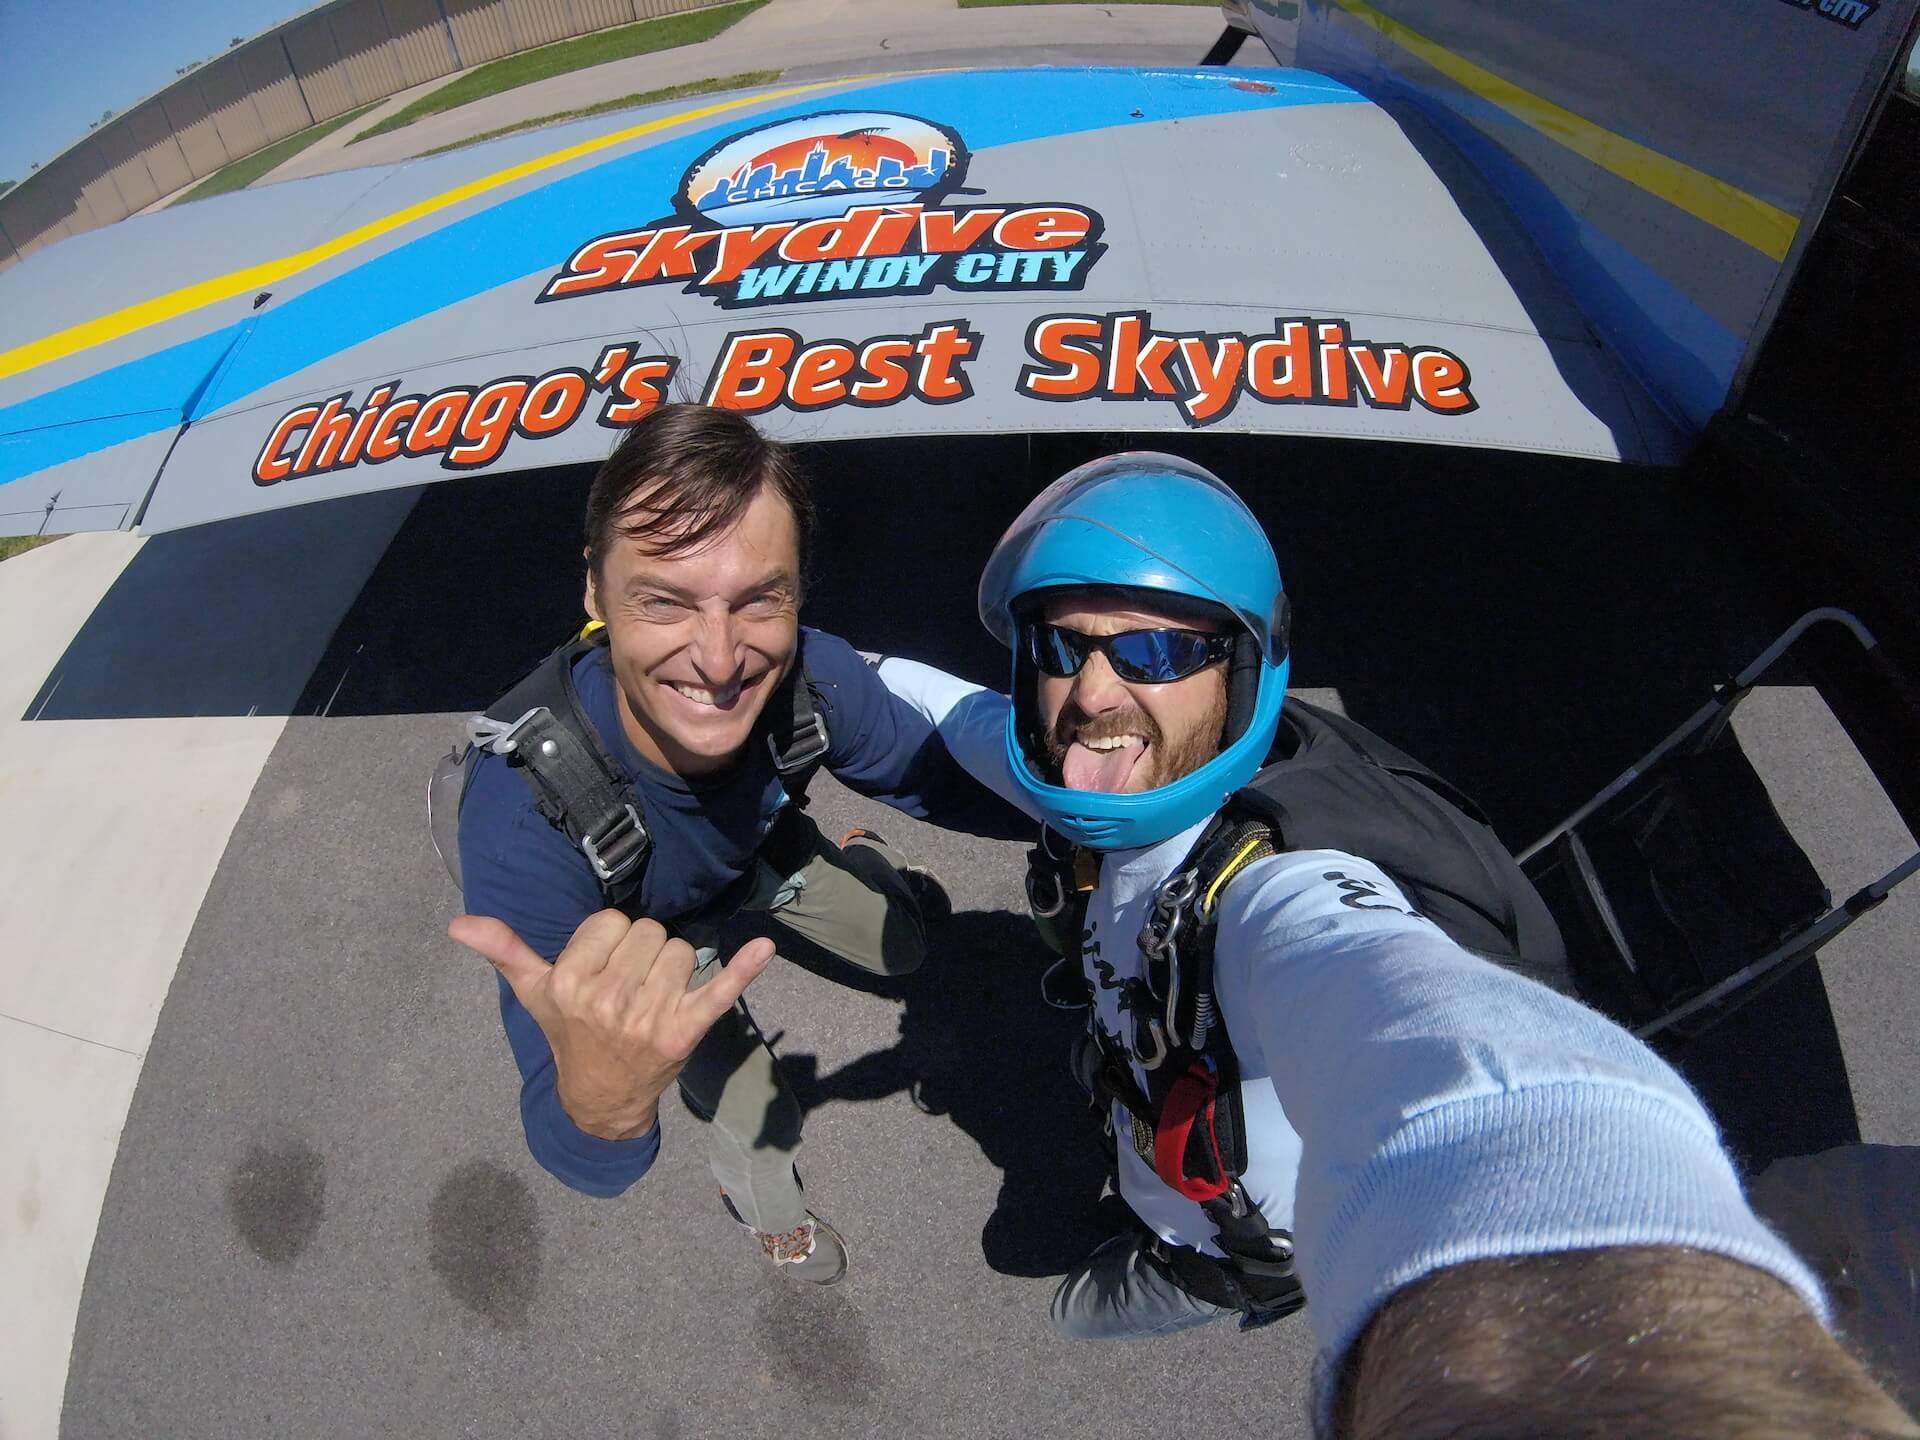 Tandem Skydive Windy City